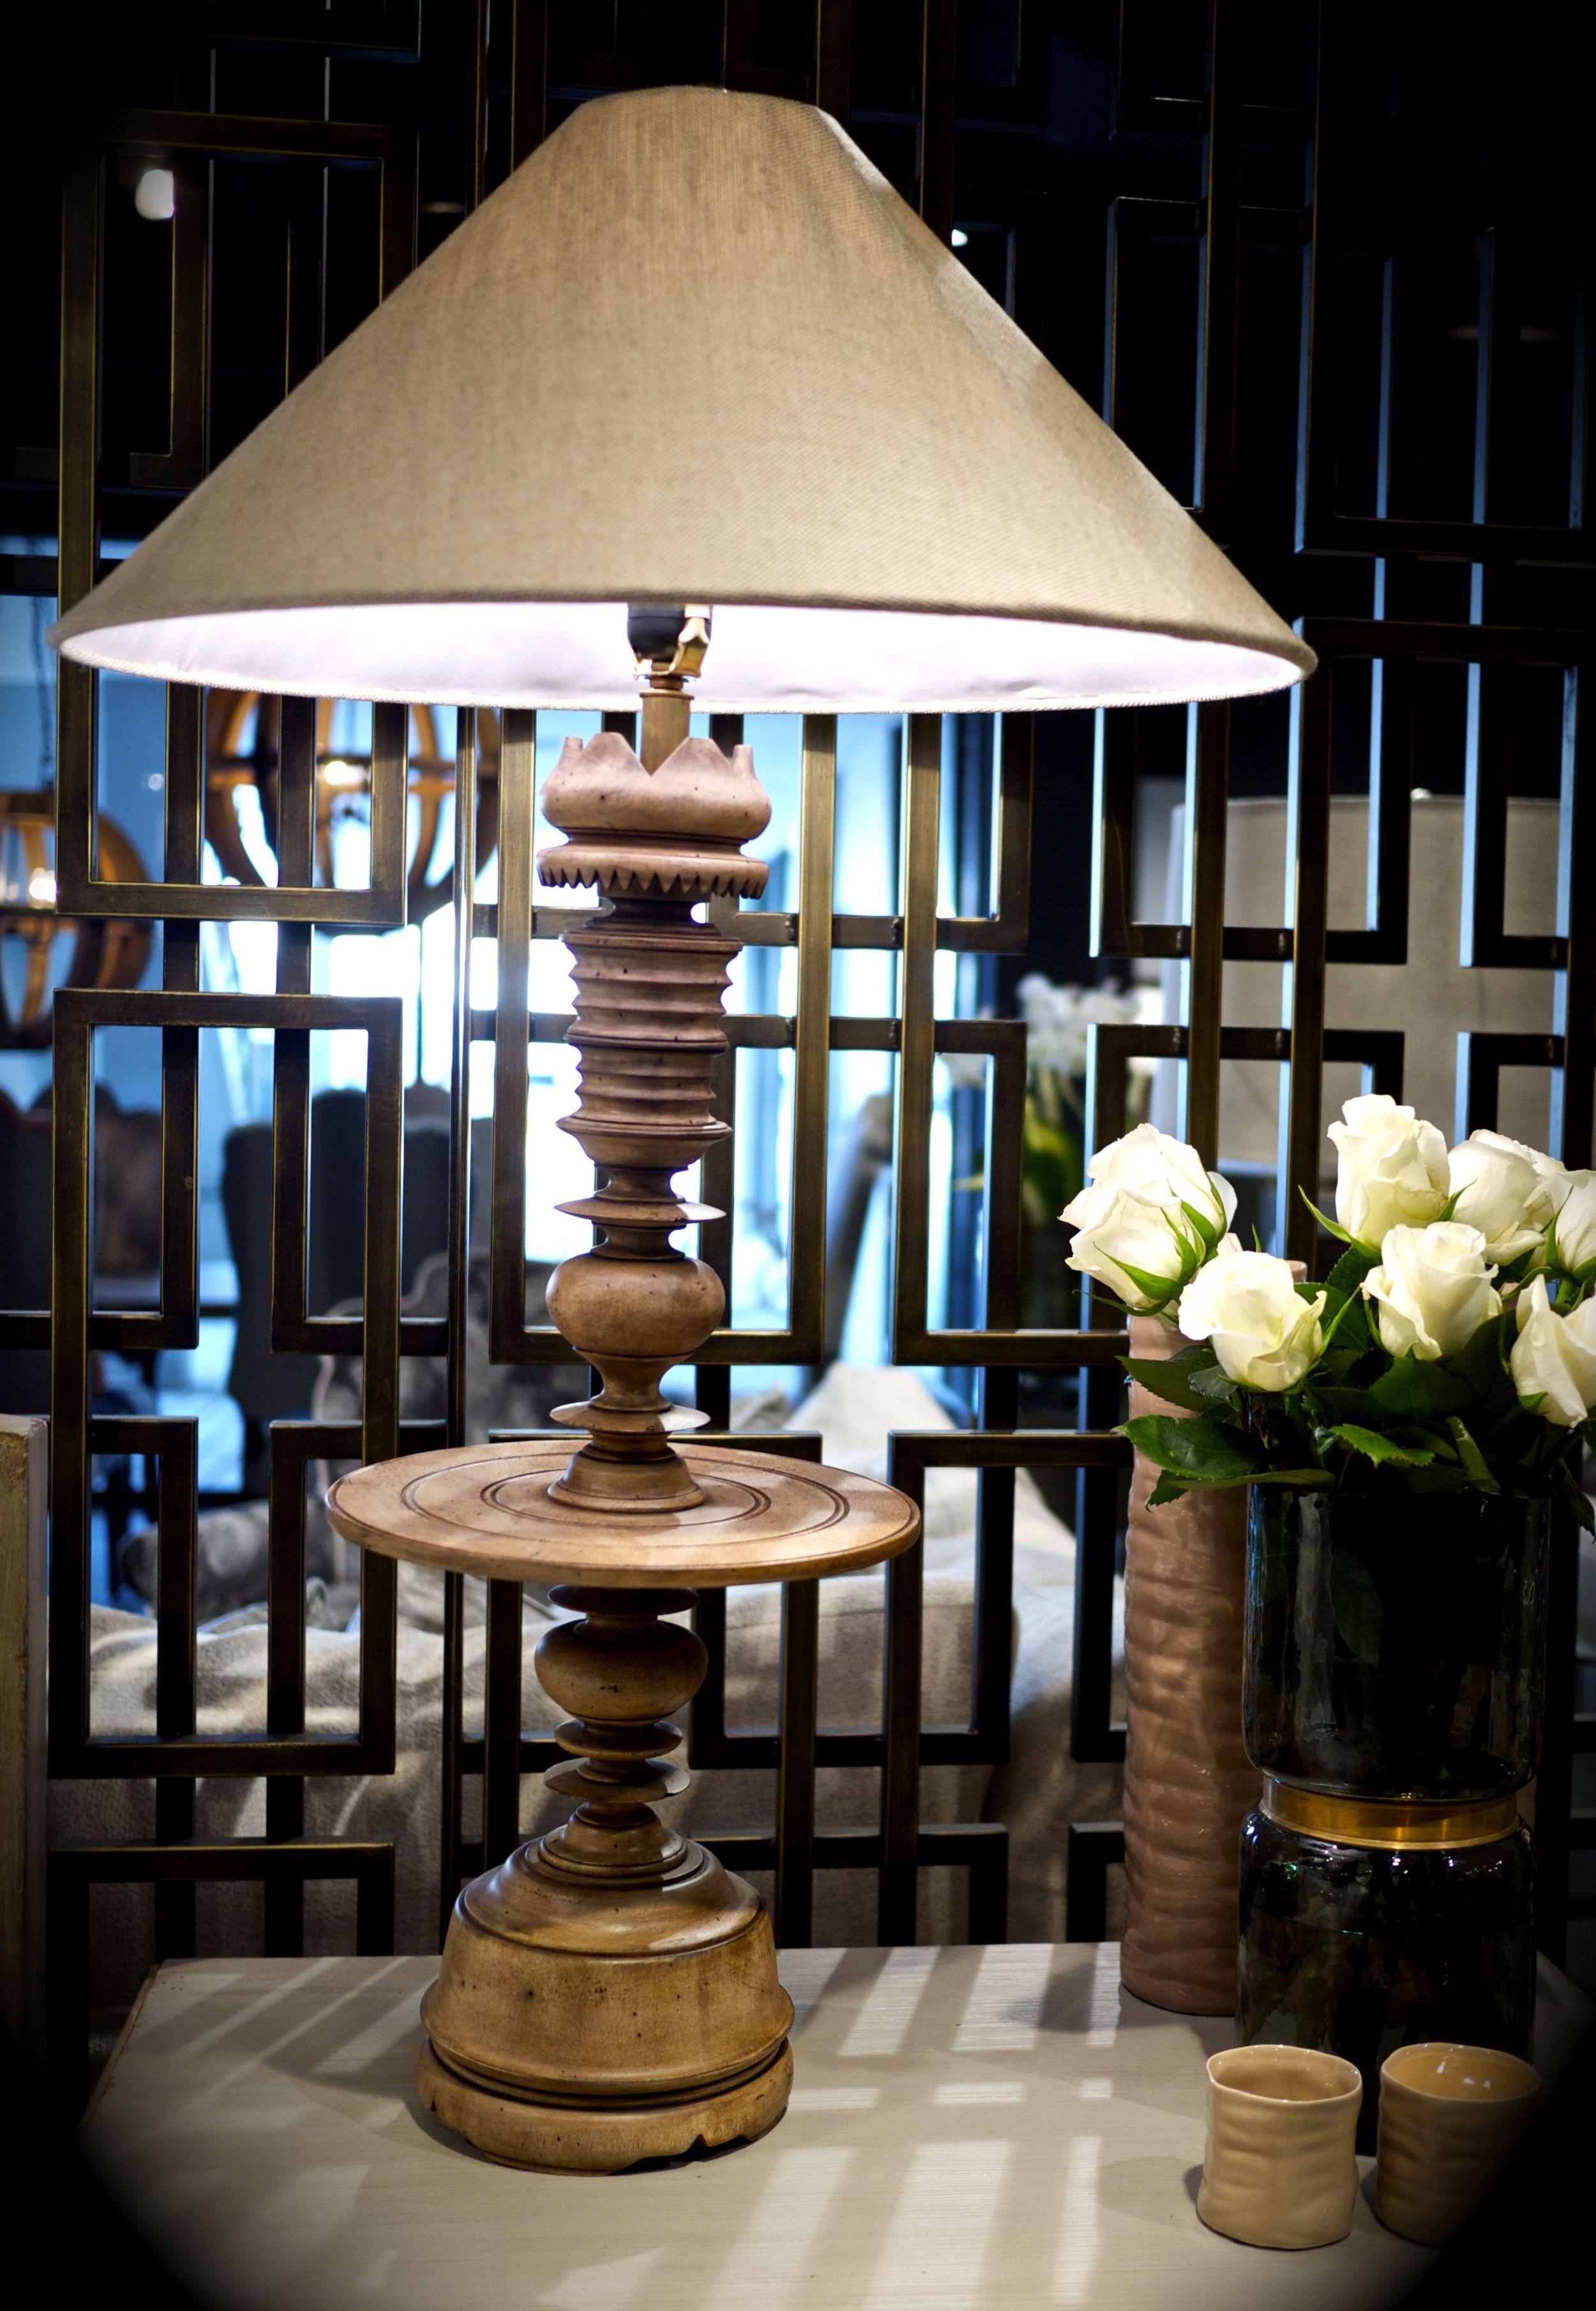 barcelona table lamp.jpg